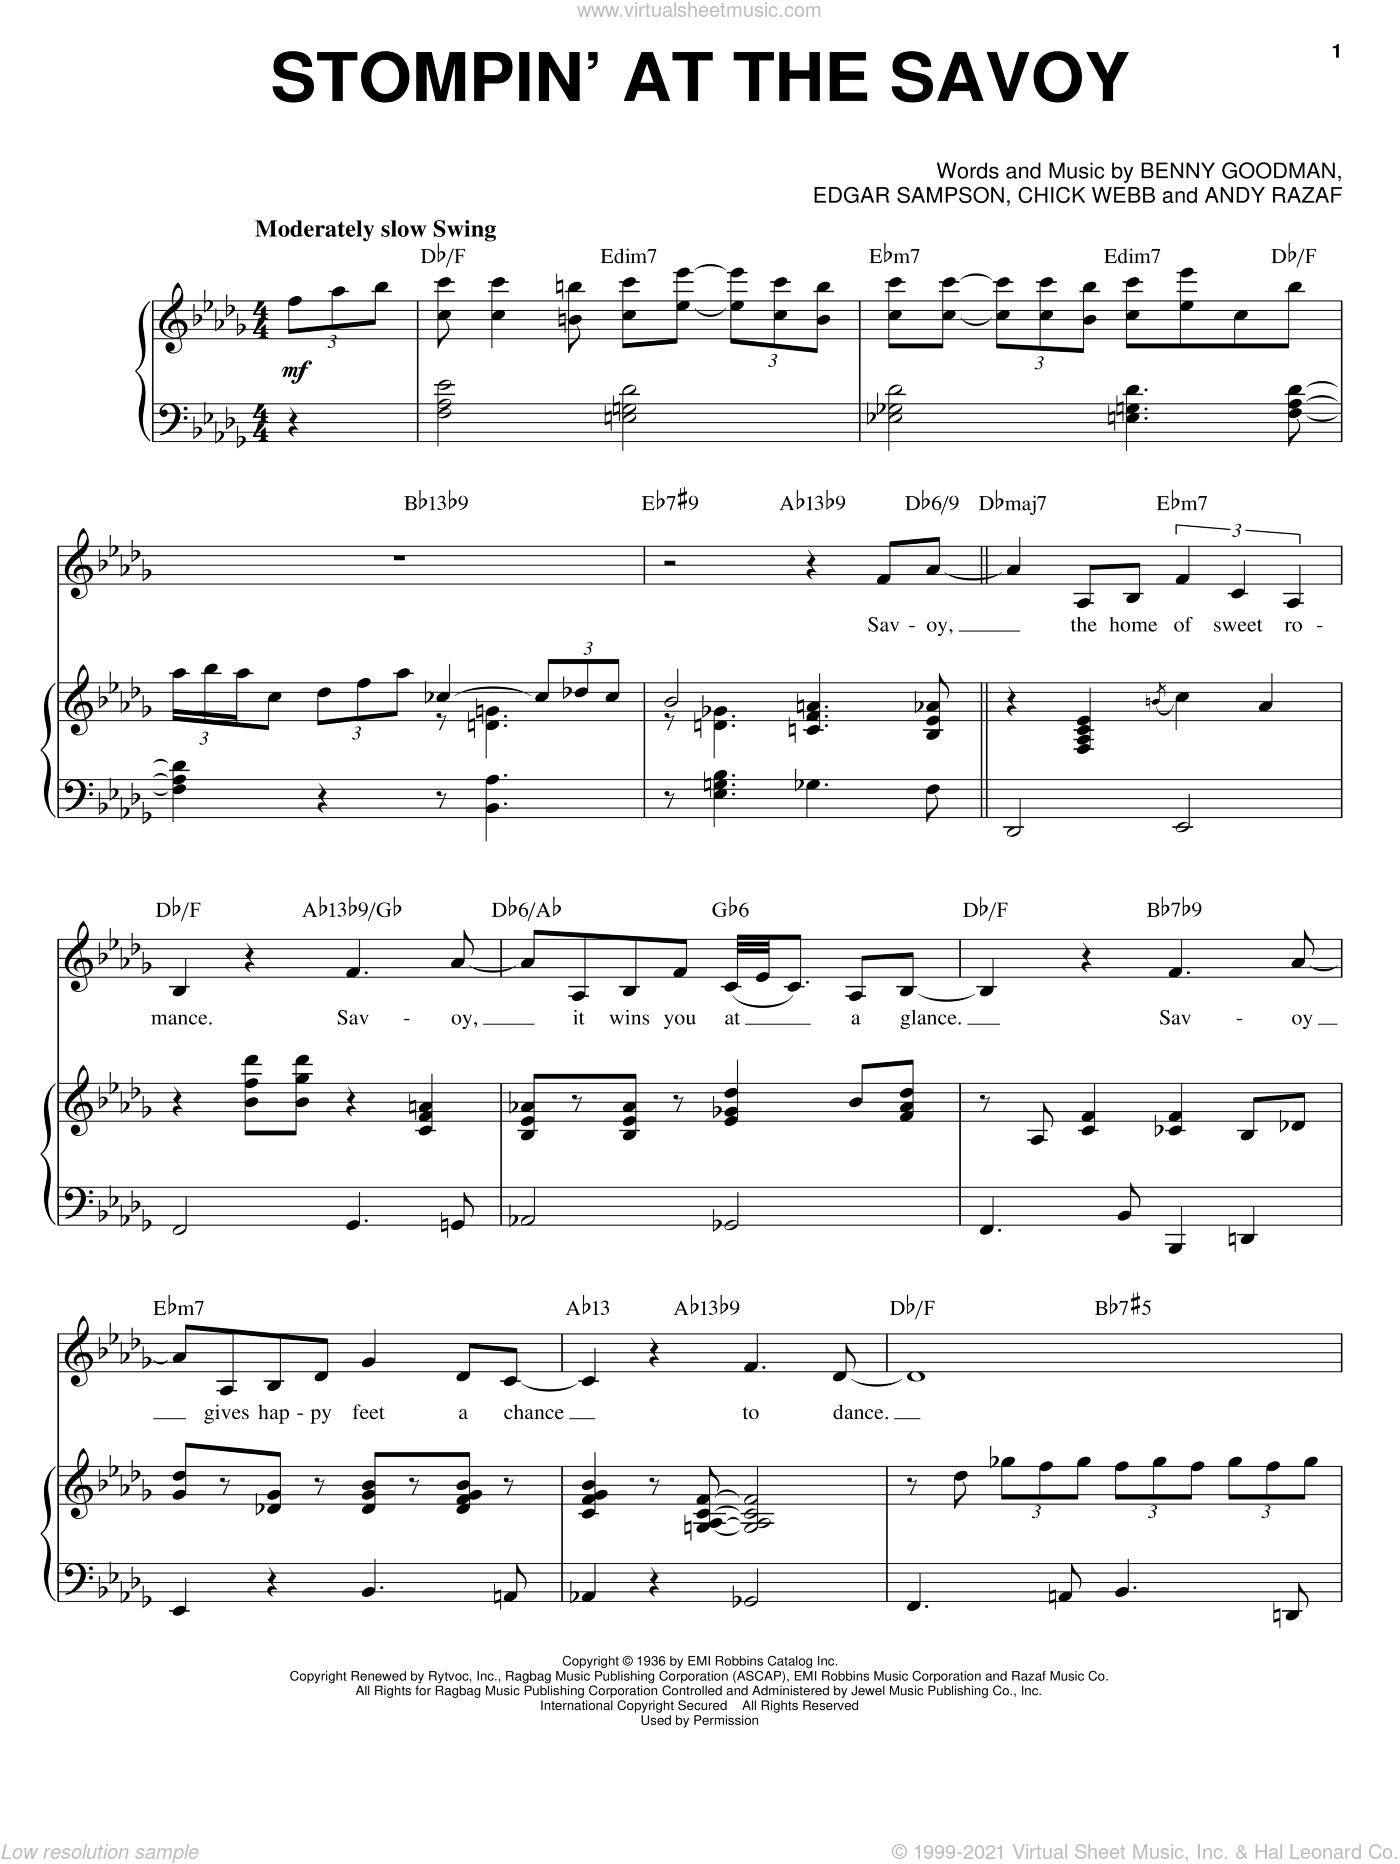 Stompin' At The Savoy sheet music for voice and piano by Ella Fitzgerald, Erroll Garner, Gene Krupa, Judy Garland, Louis Armstrong, Norah Jones, Teddy Wilson, Andy Razaf, Benny Goodman, Chick Webb and Edgar Sampson, intermediate skill level